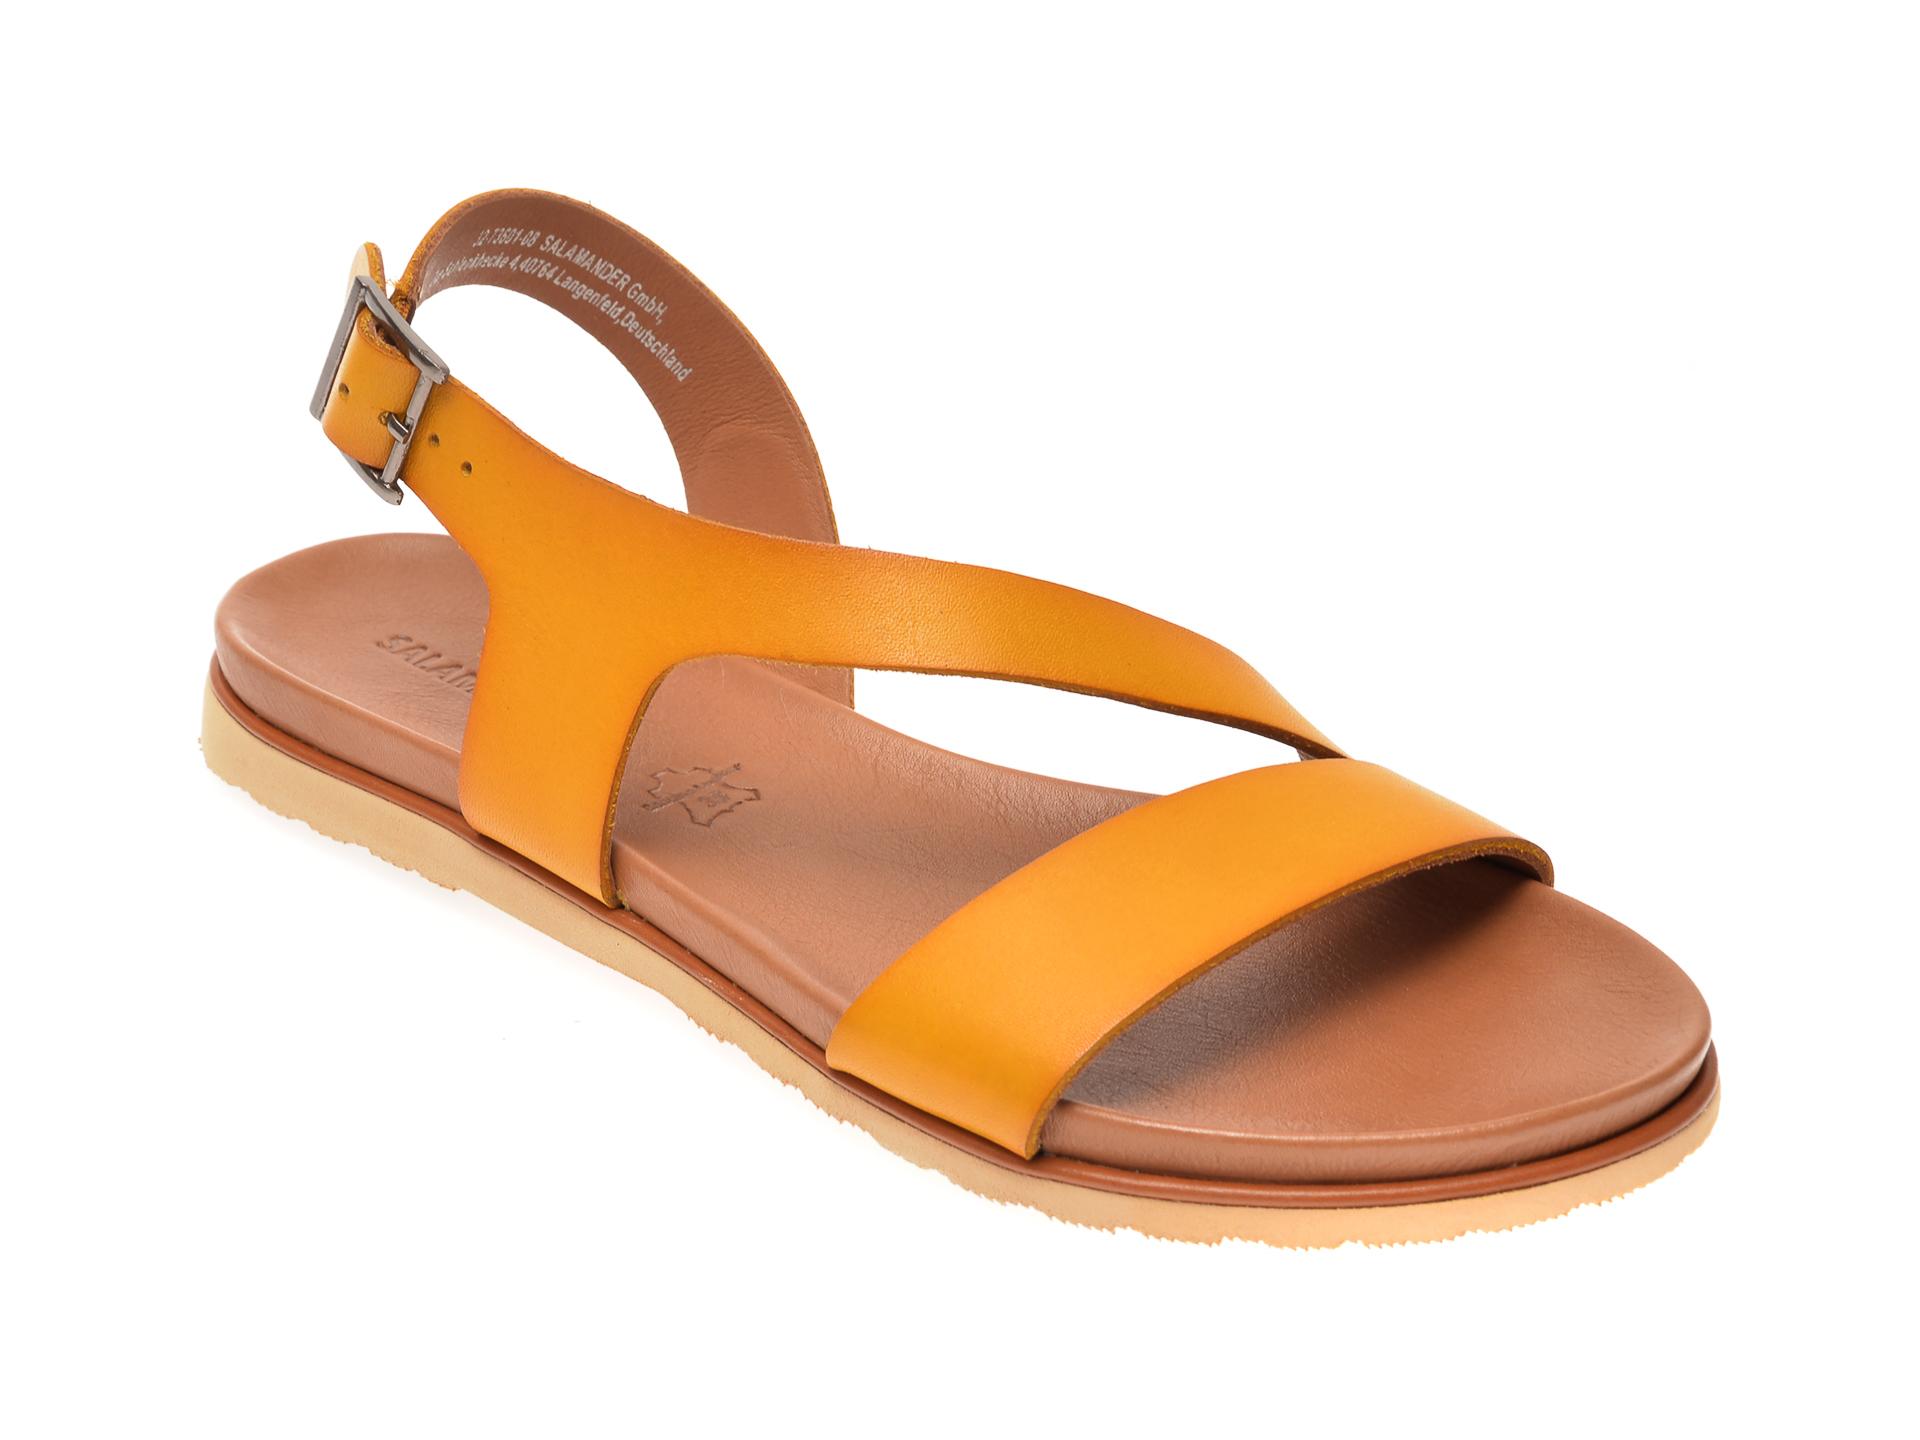 Sandale SALAMANDER galbene, 15019, din piele naturala imagine